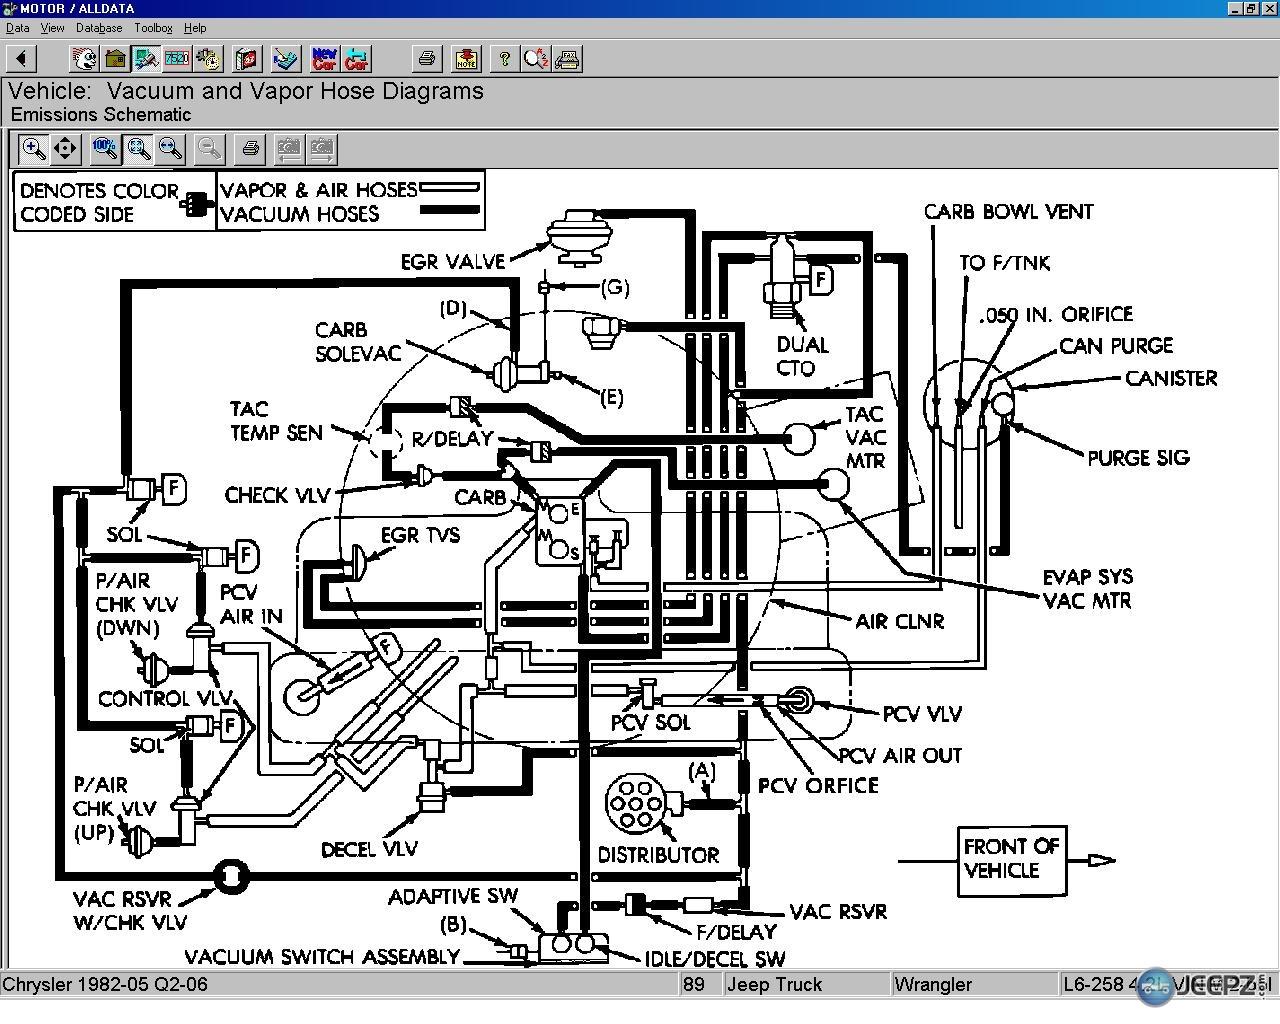 carburetor vacuum line diagram farmall super c wiring edelbrock 1406 carb engine and